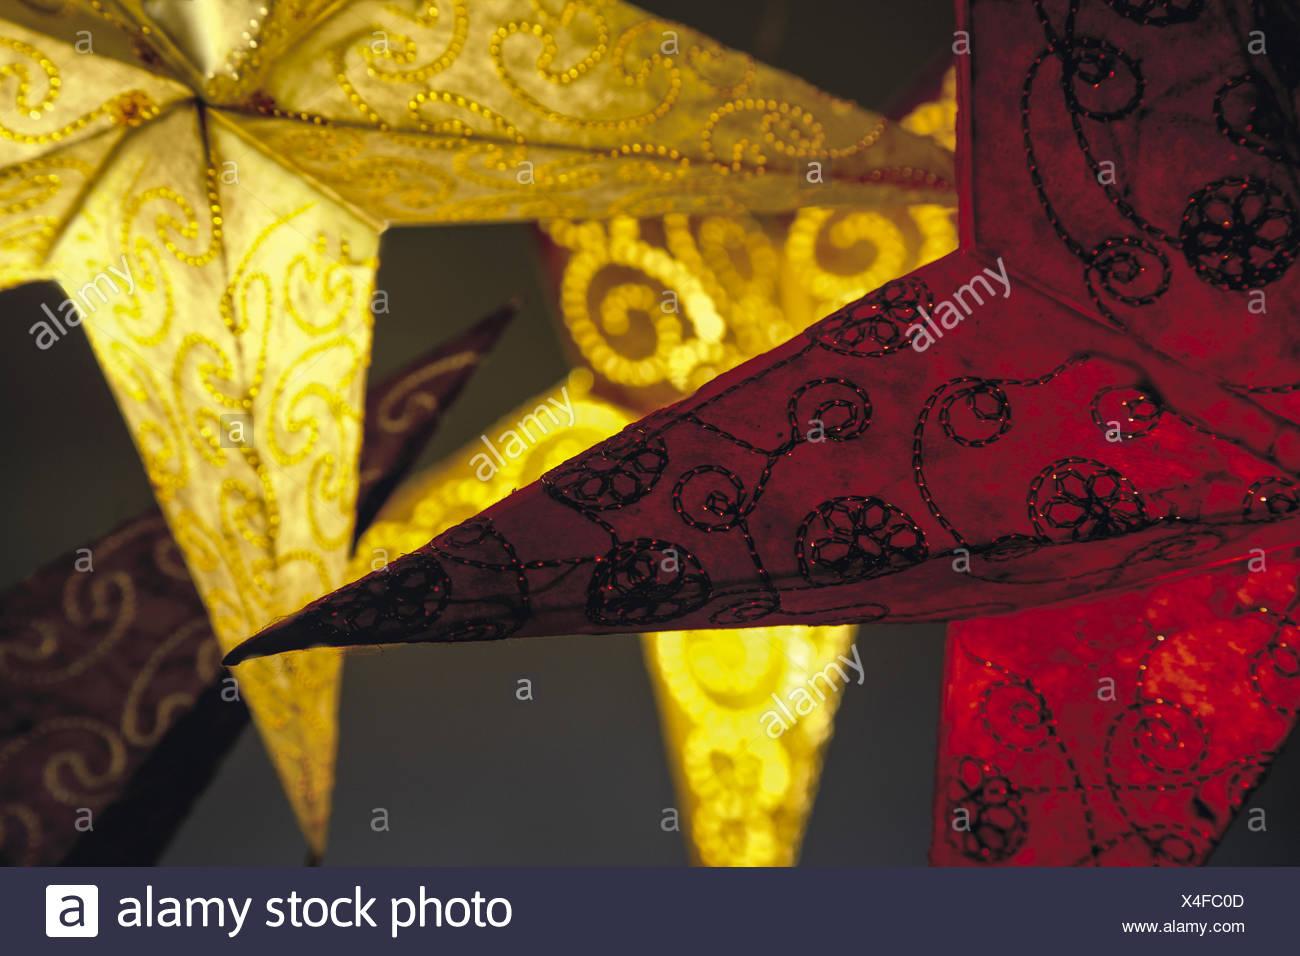 Leuchtende Papiersterne - Stock Image